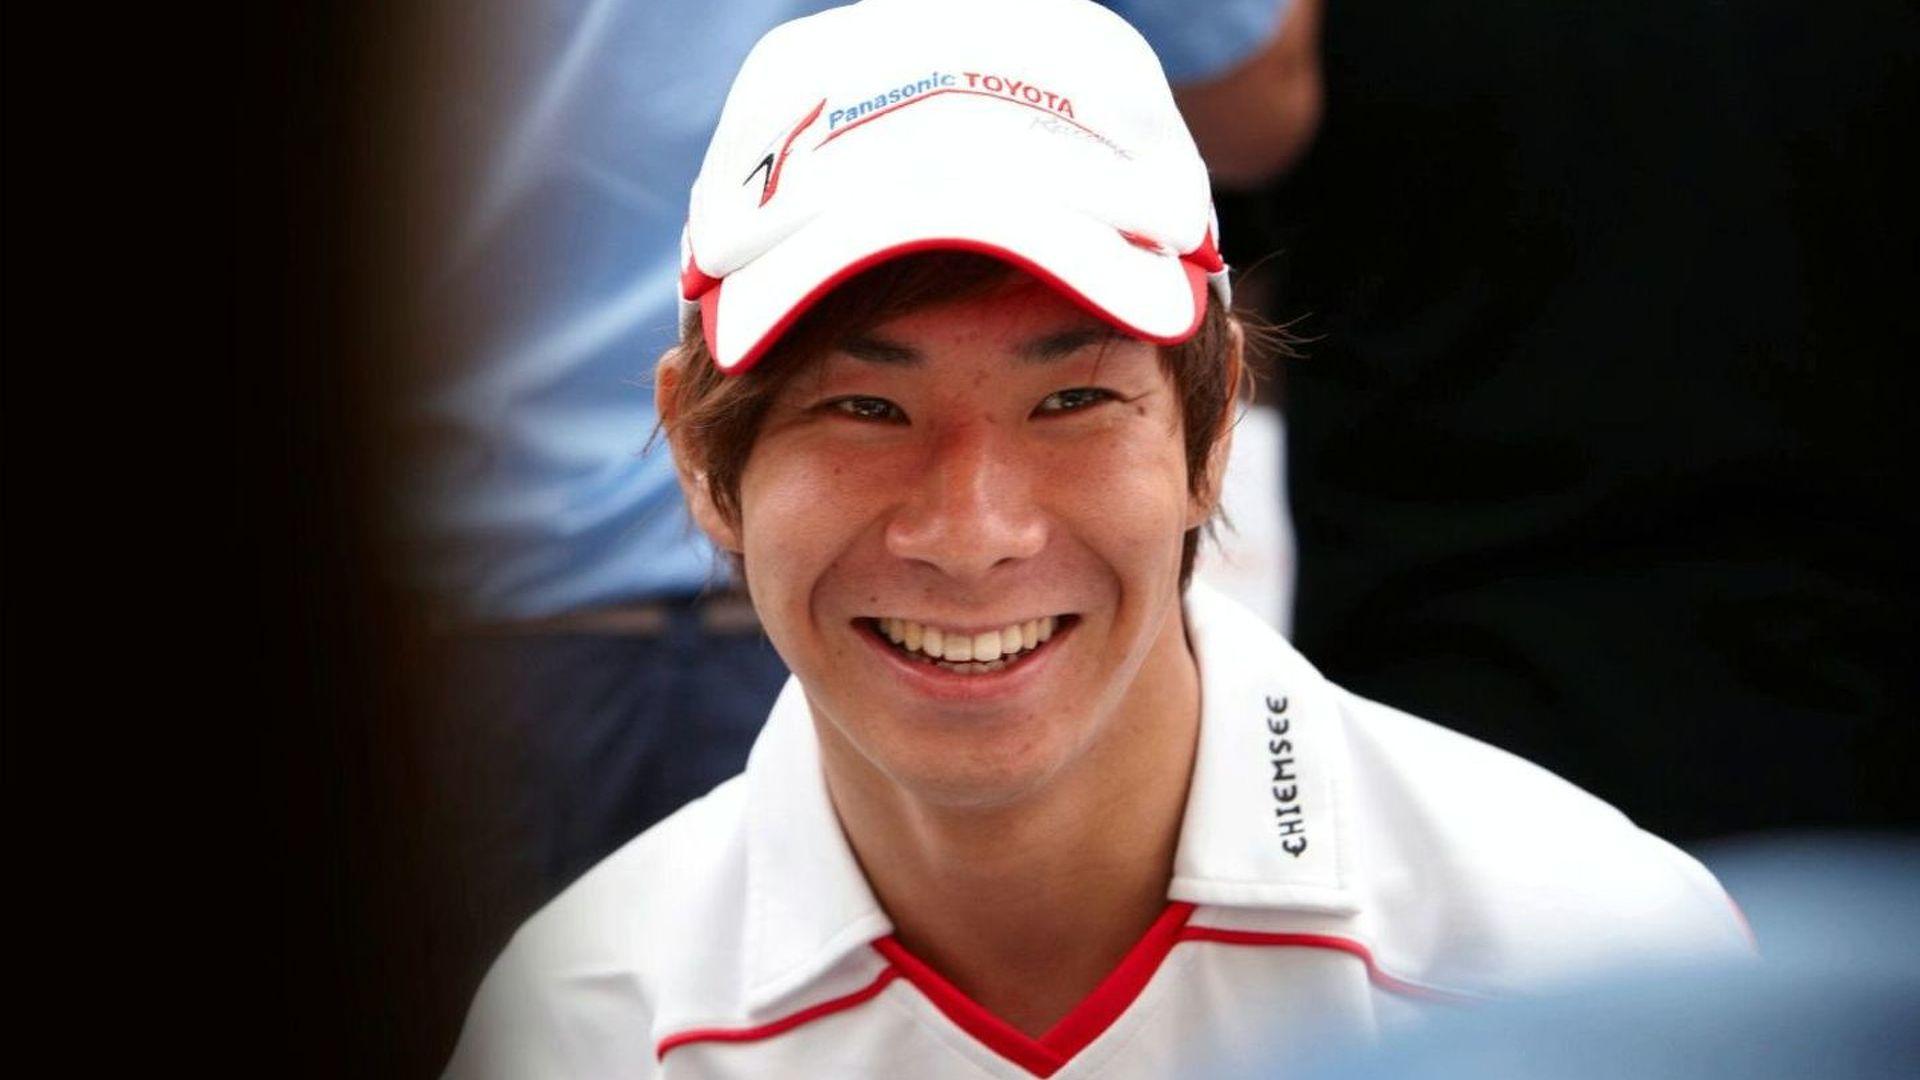 Kobayashi possible for 2010 seat - Howett